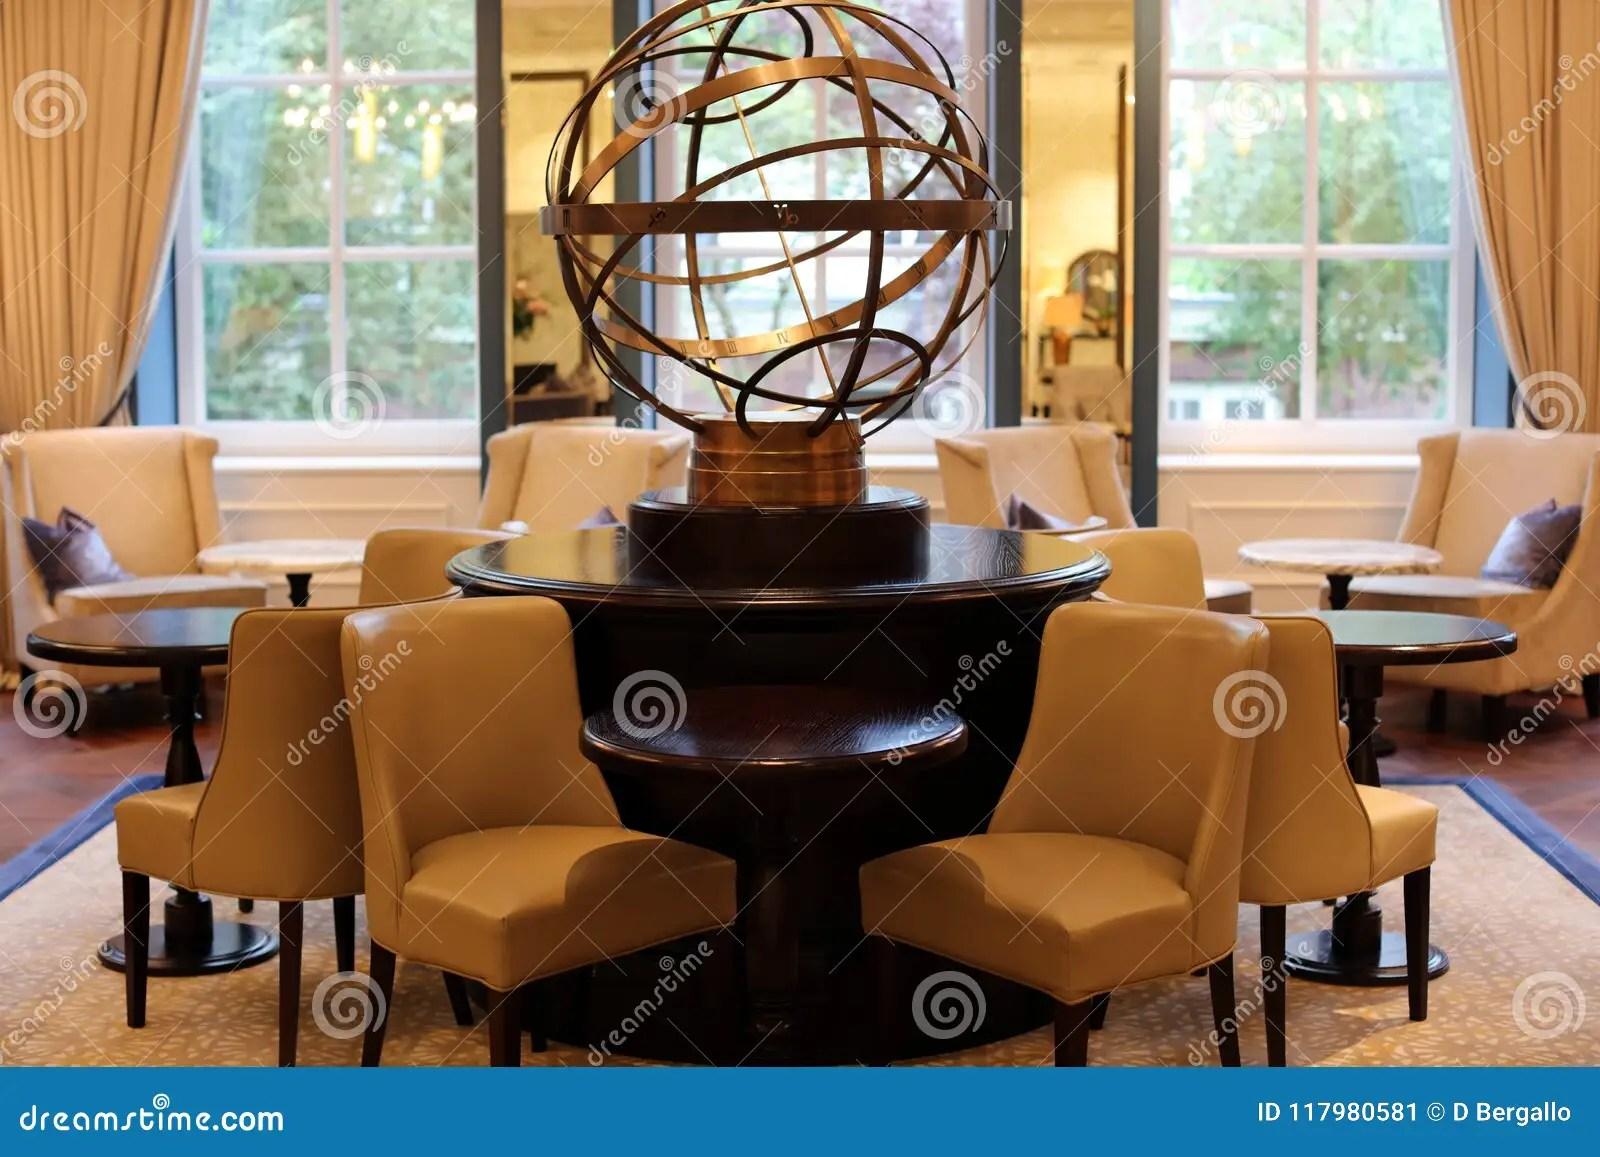 Classy Elegant And Modern Hotel Lobby At Amsterdam The